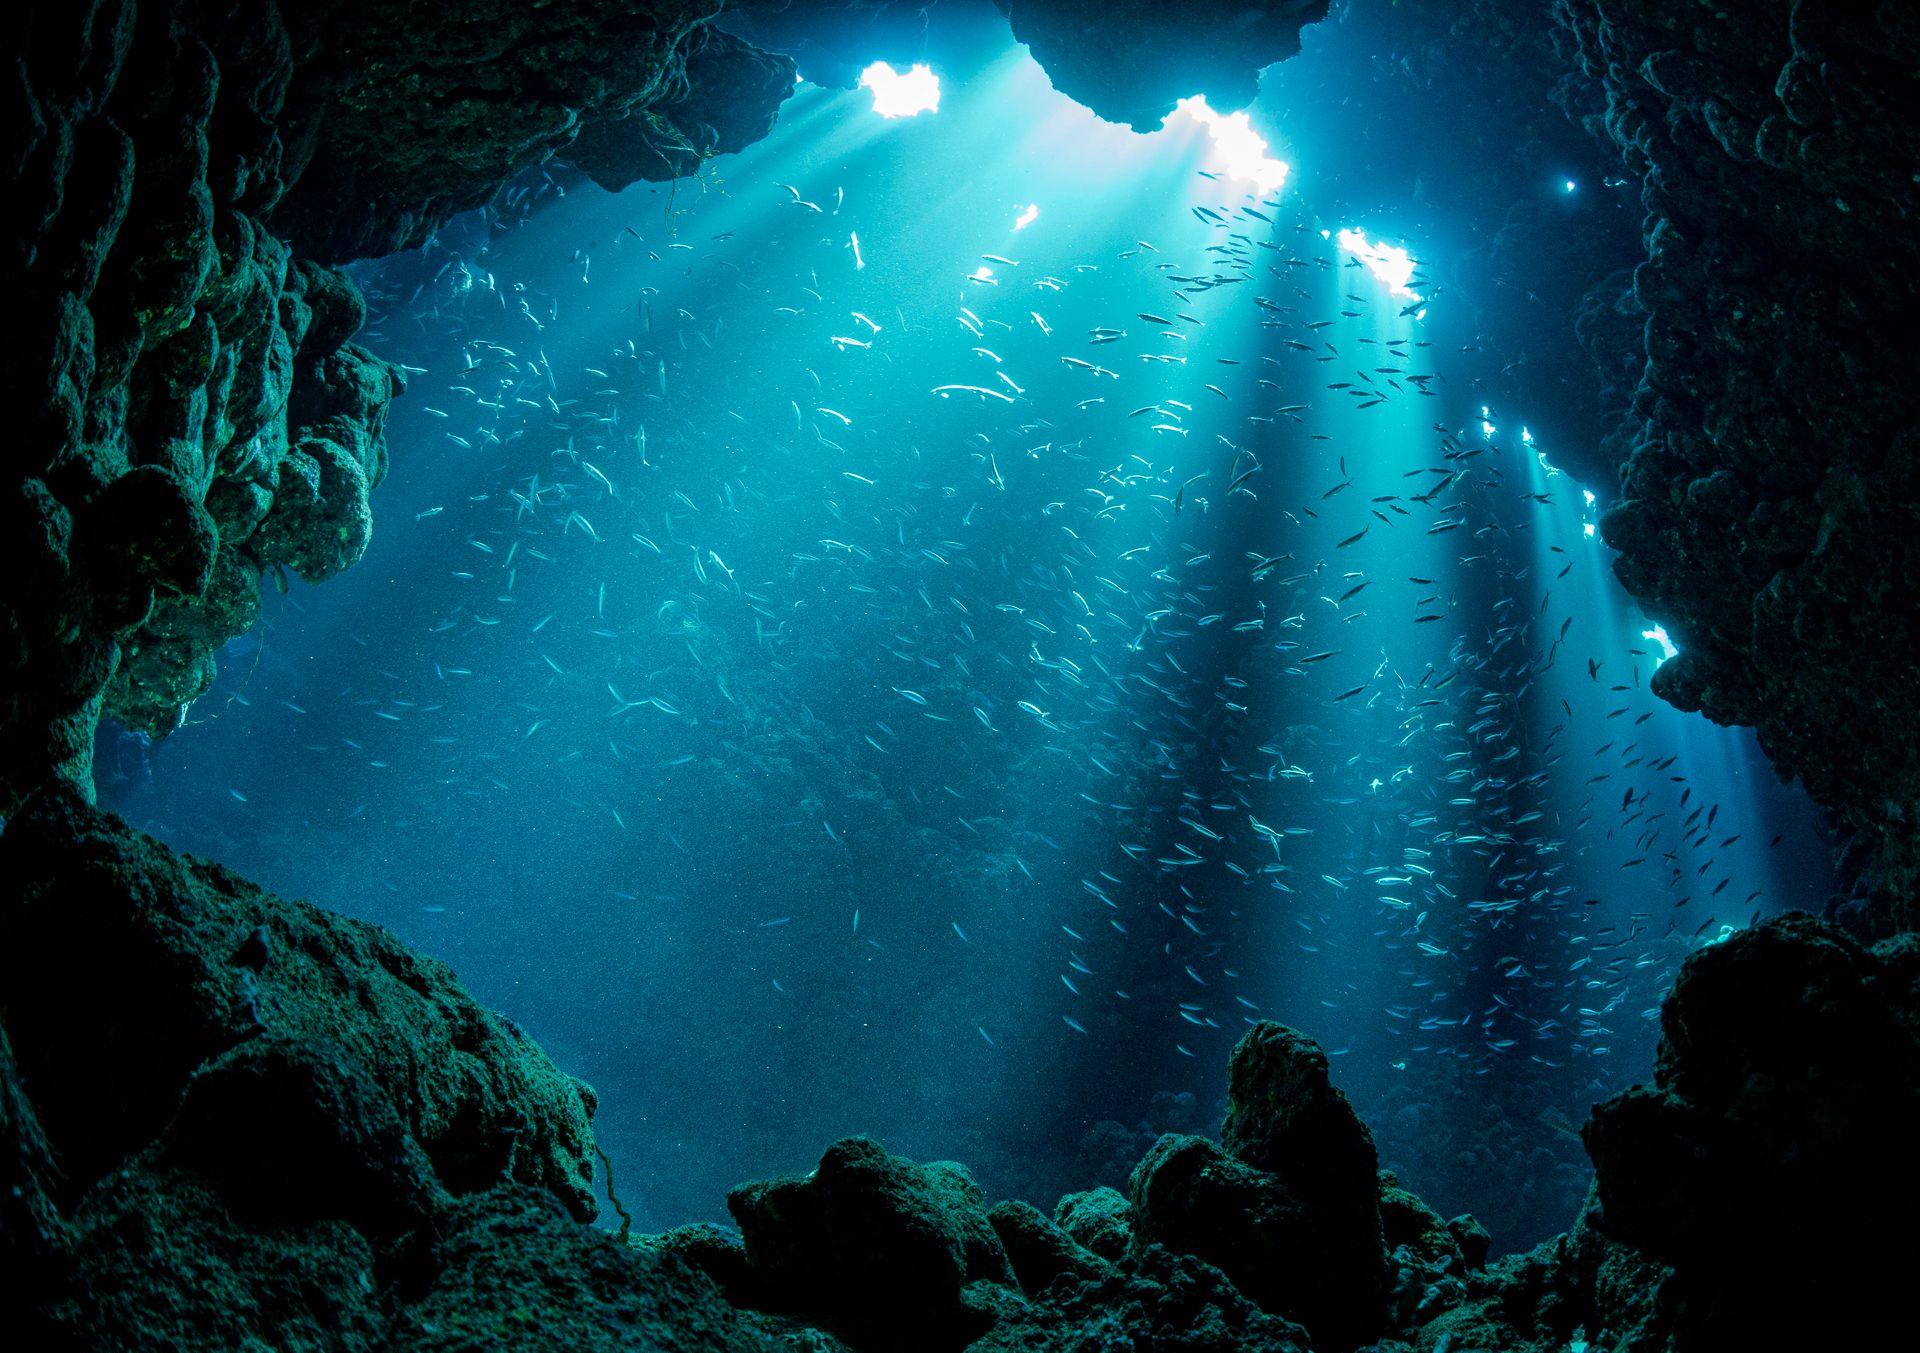 underwater, cavern, cave, diving, underwater photography, landscape, mystic, water, fish, rock, Kulagina Nadya